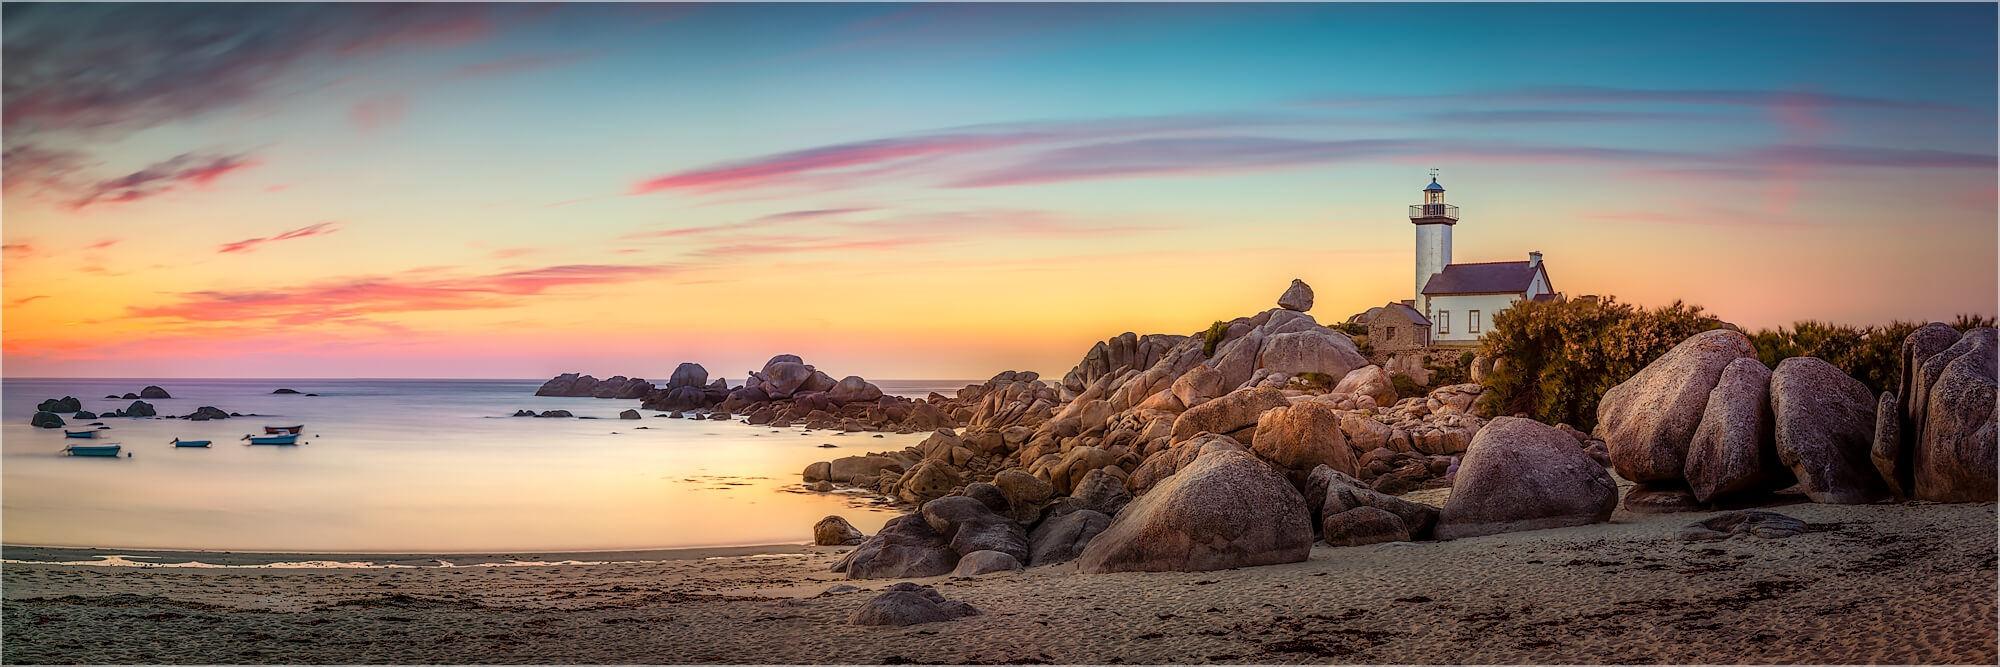 Panoramafoto Frankreich Bretagne Strand von Pontusval